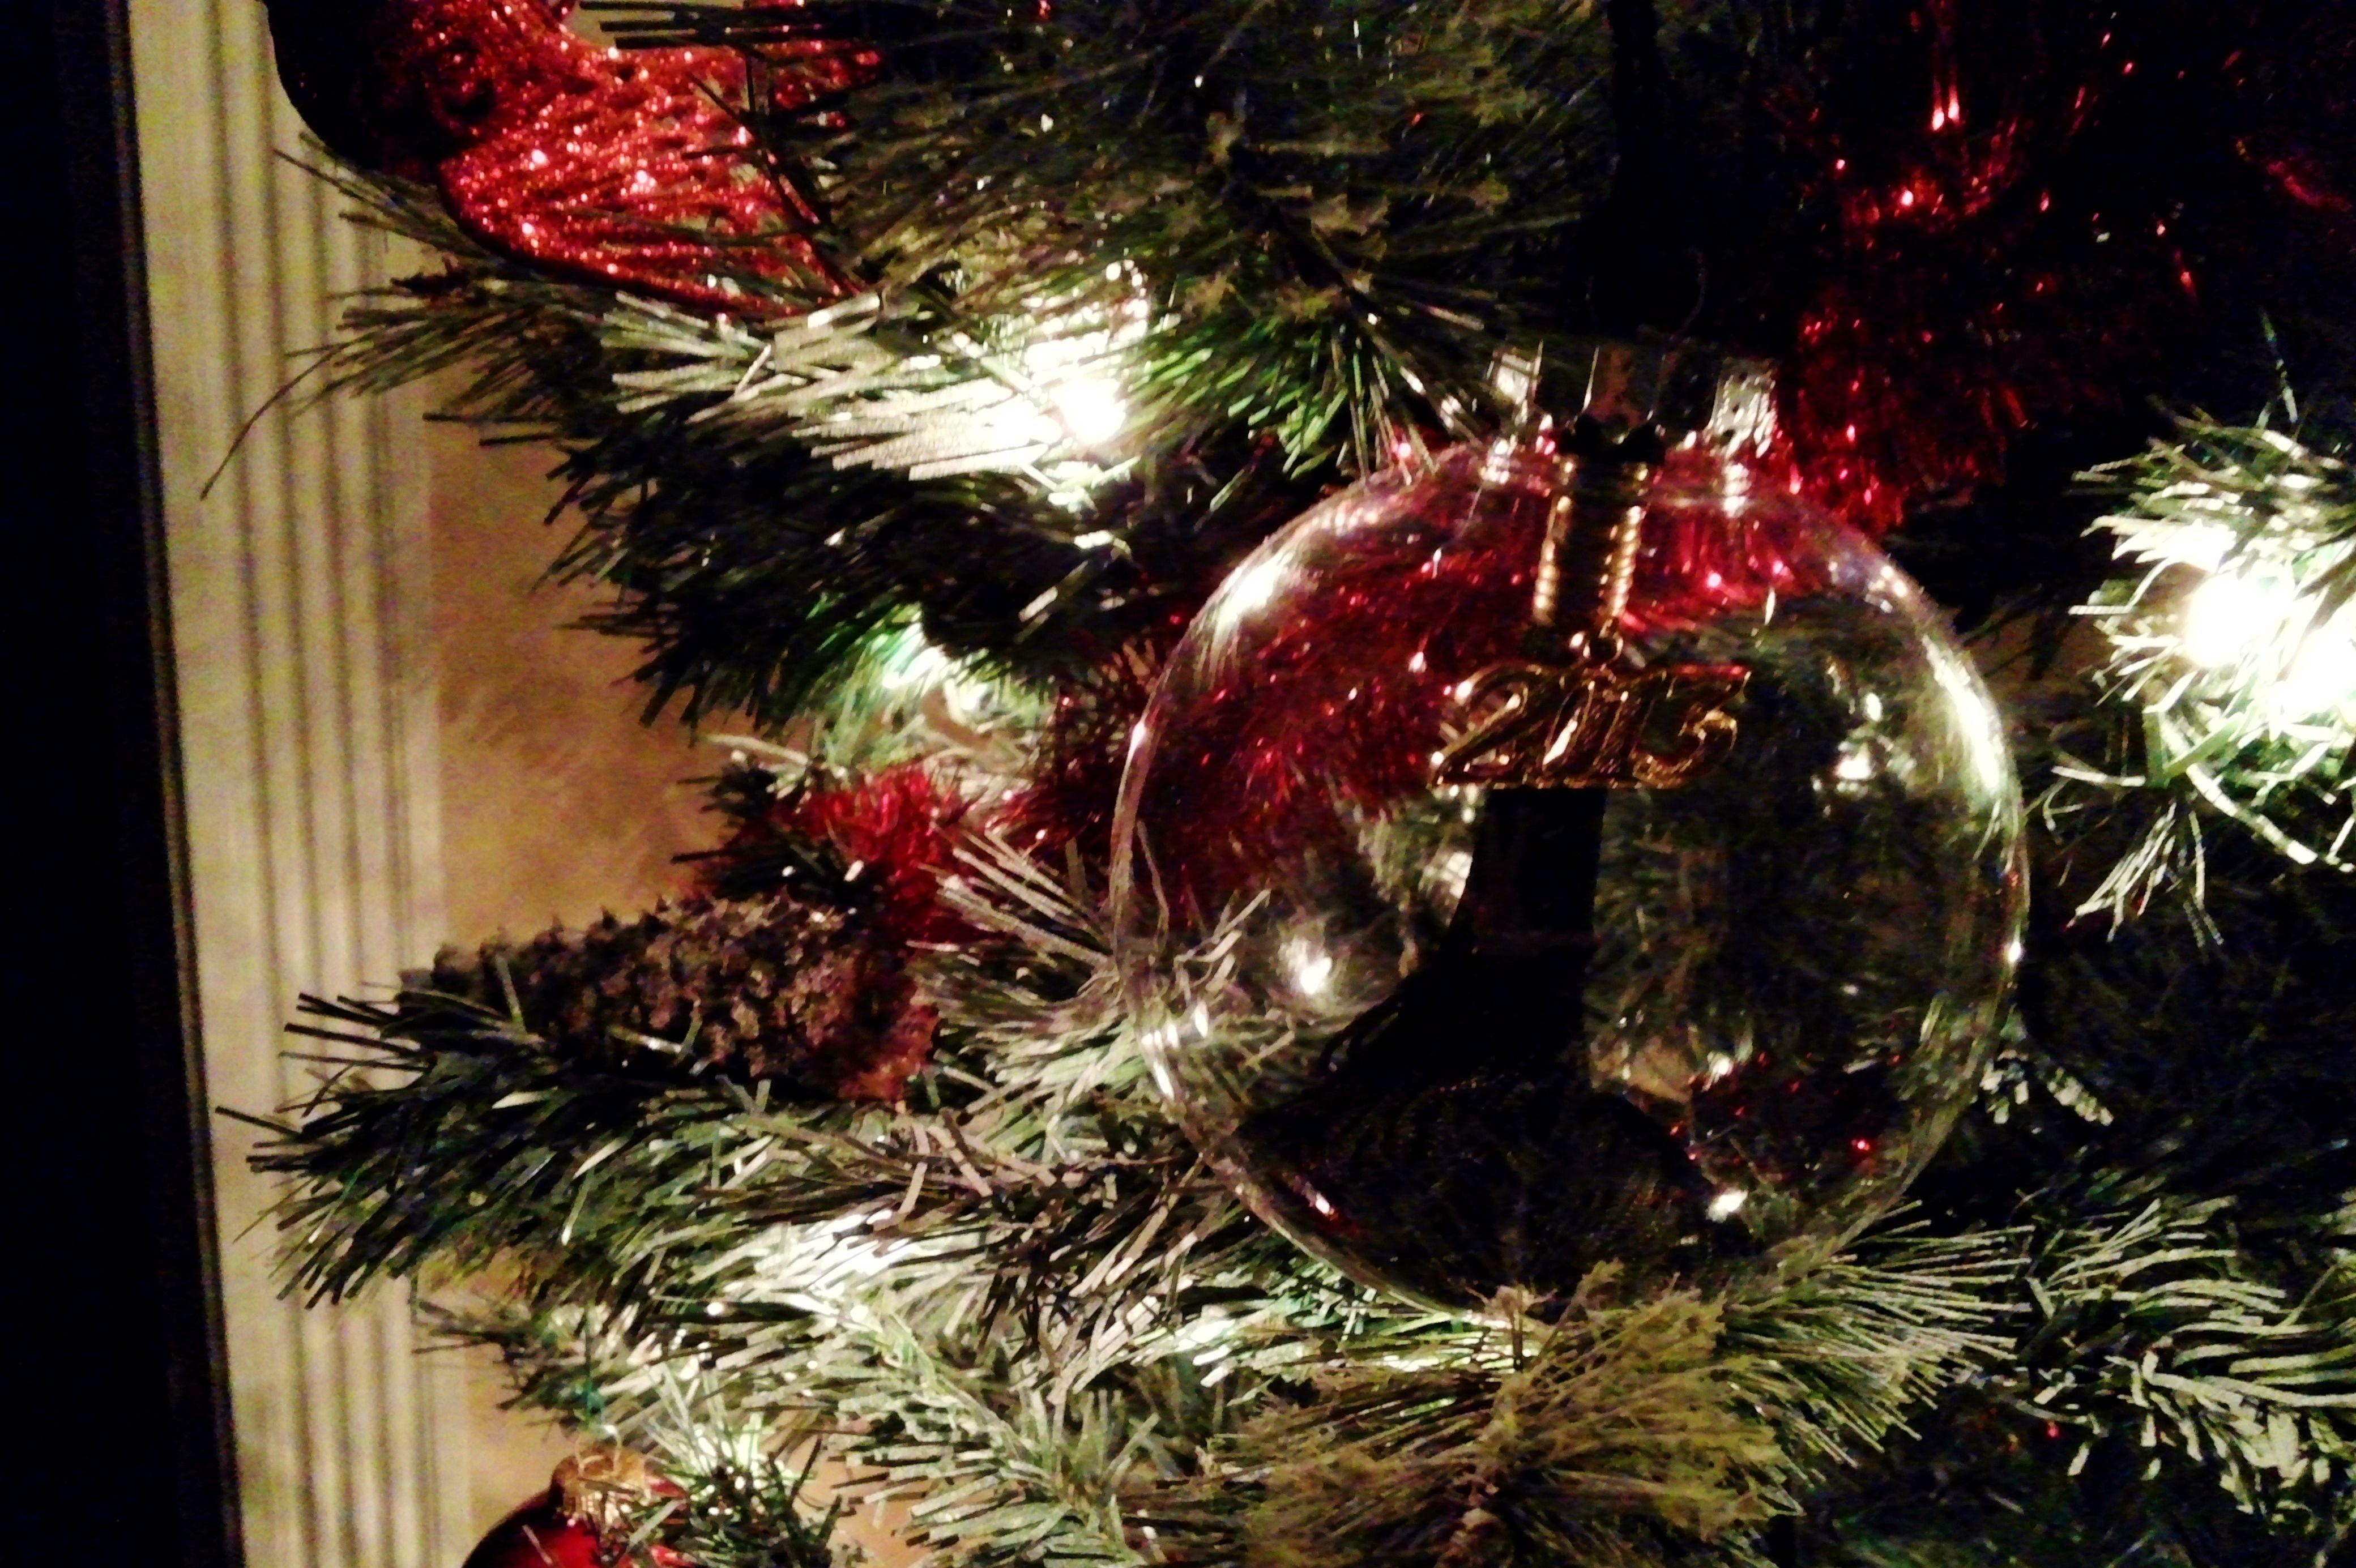 My College Graduation Tassel inside a clear Christmas Ornament